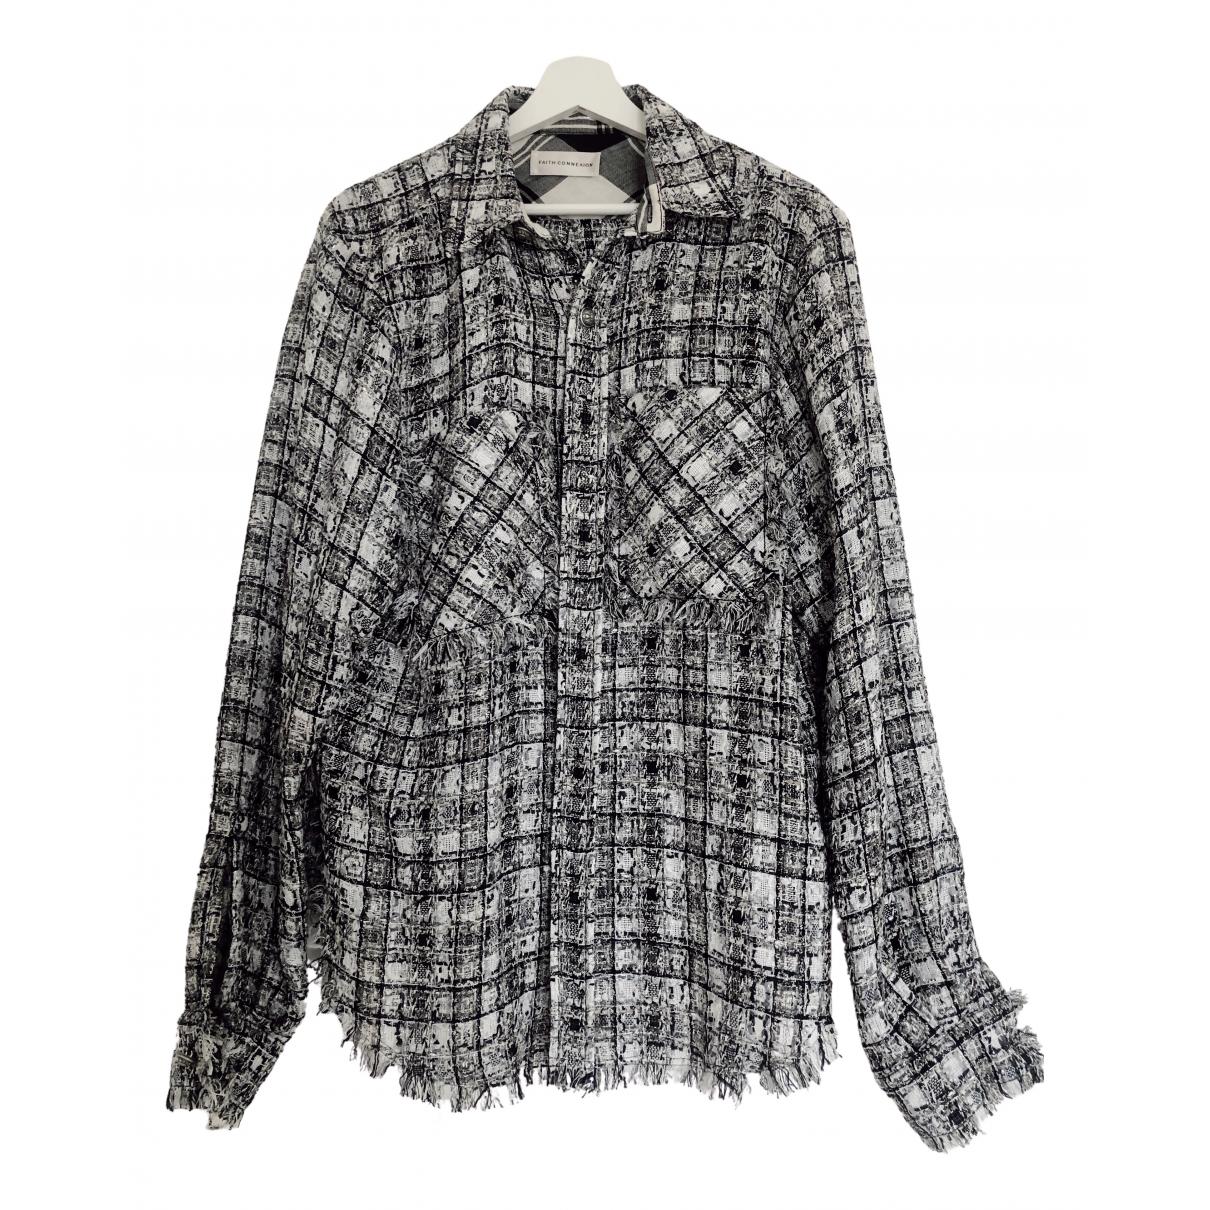 Camisa Tweed Faith Connexion